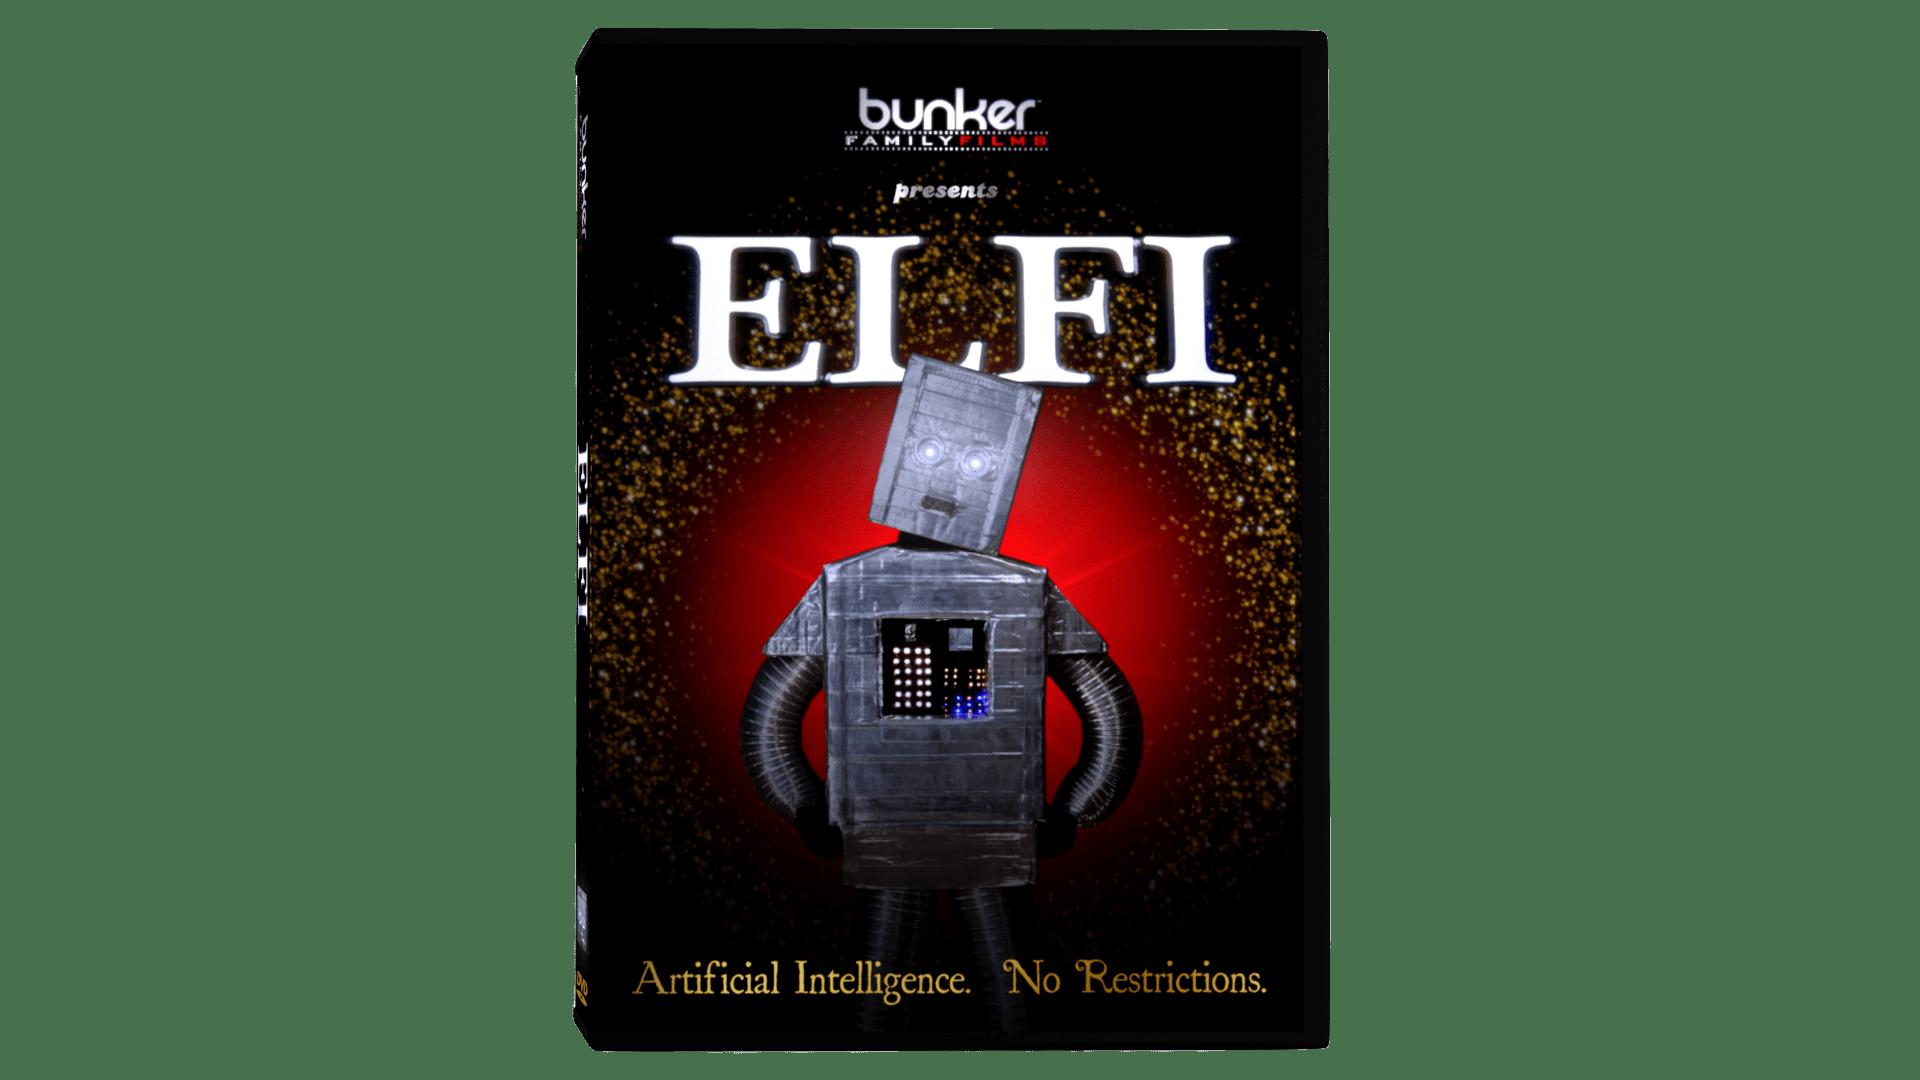 ELFI – A Fun Family Film for the Holidays!